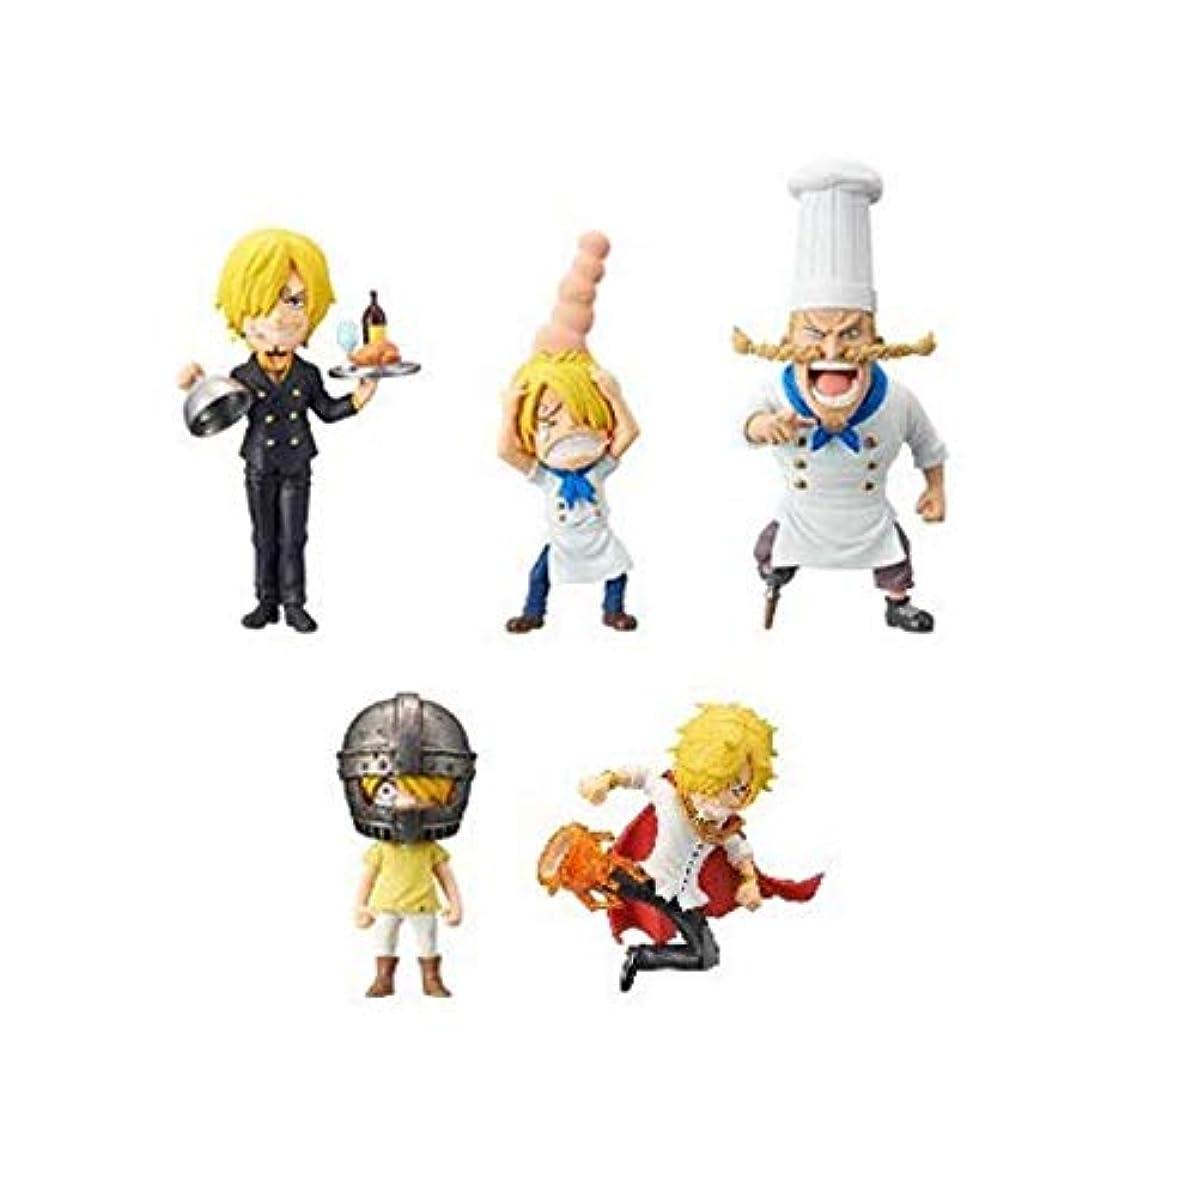 Banpresto One Piece WCF -History Sanji- Except Baratie 5 Set Japan Figures